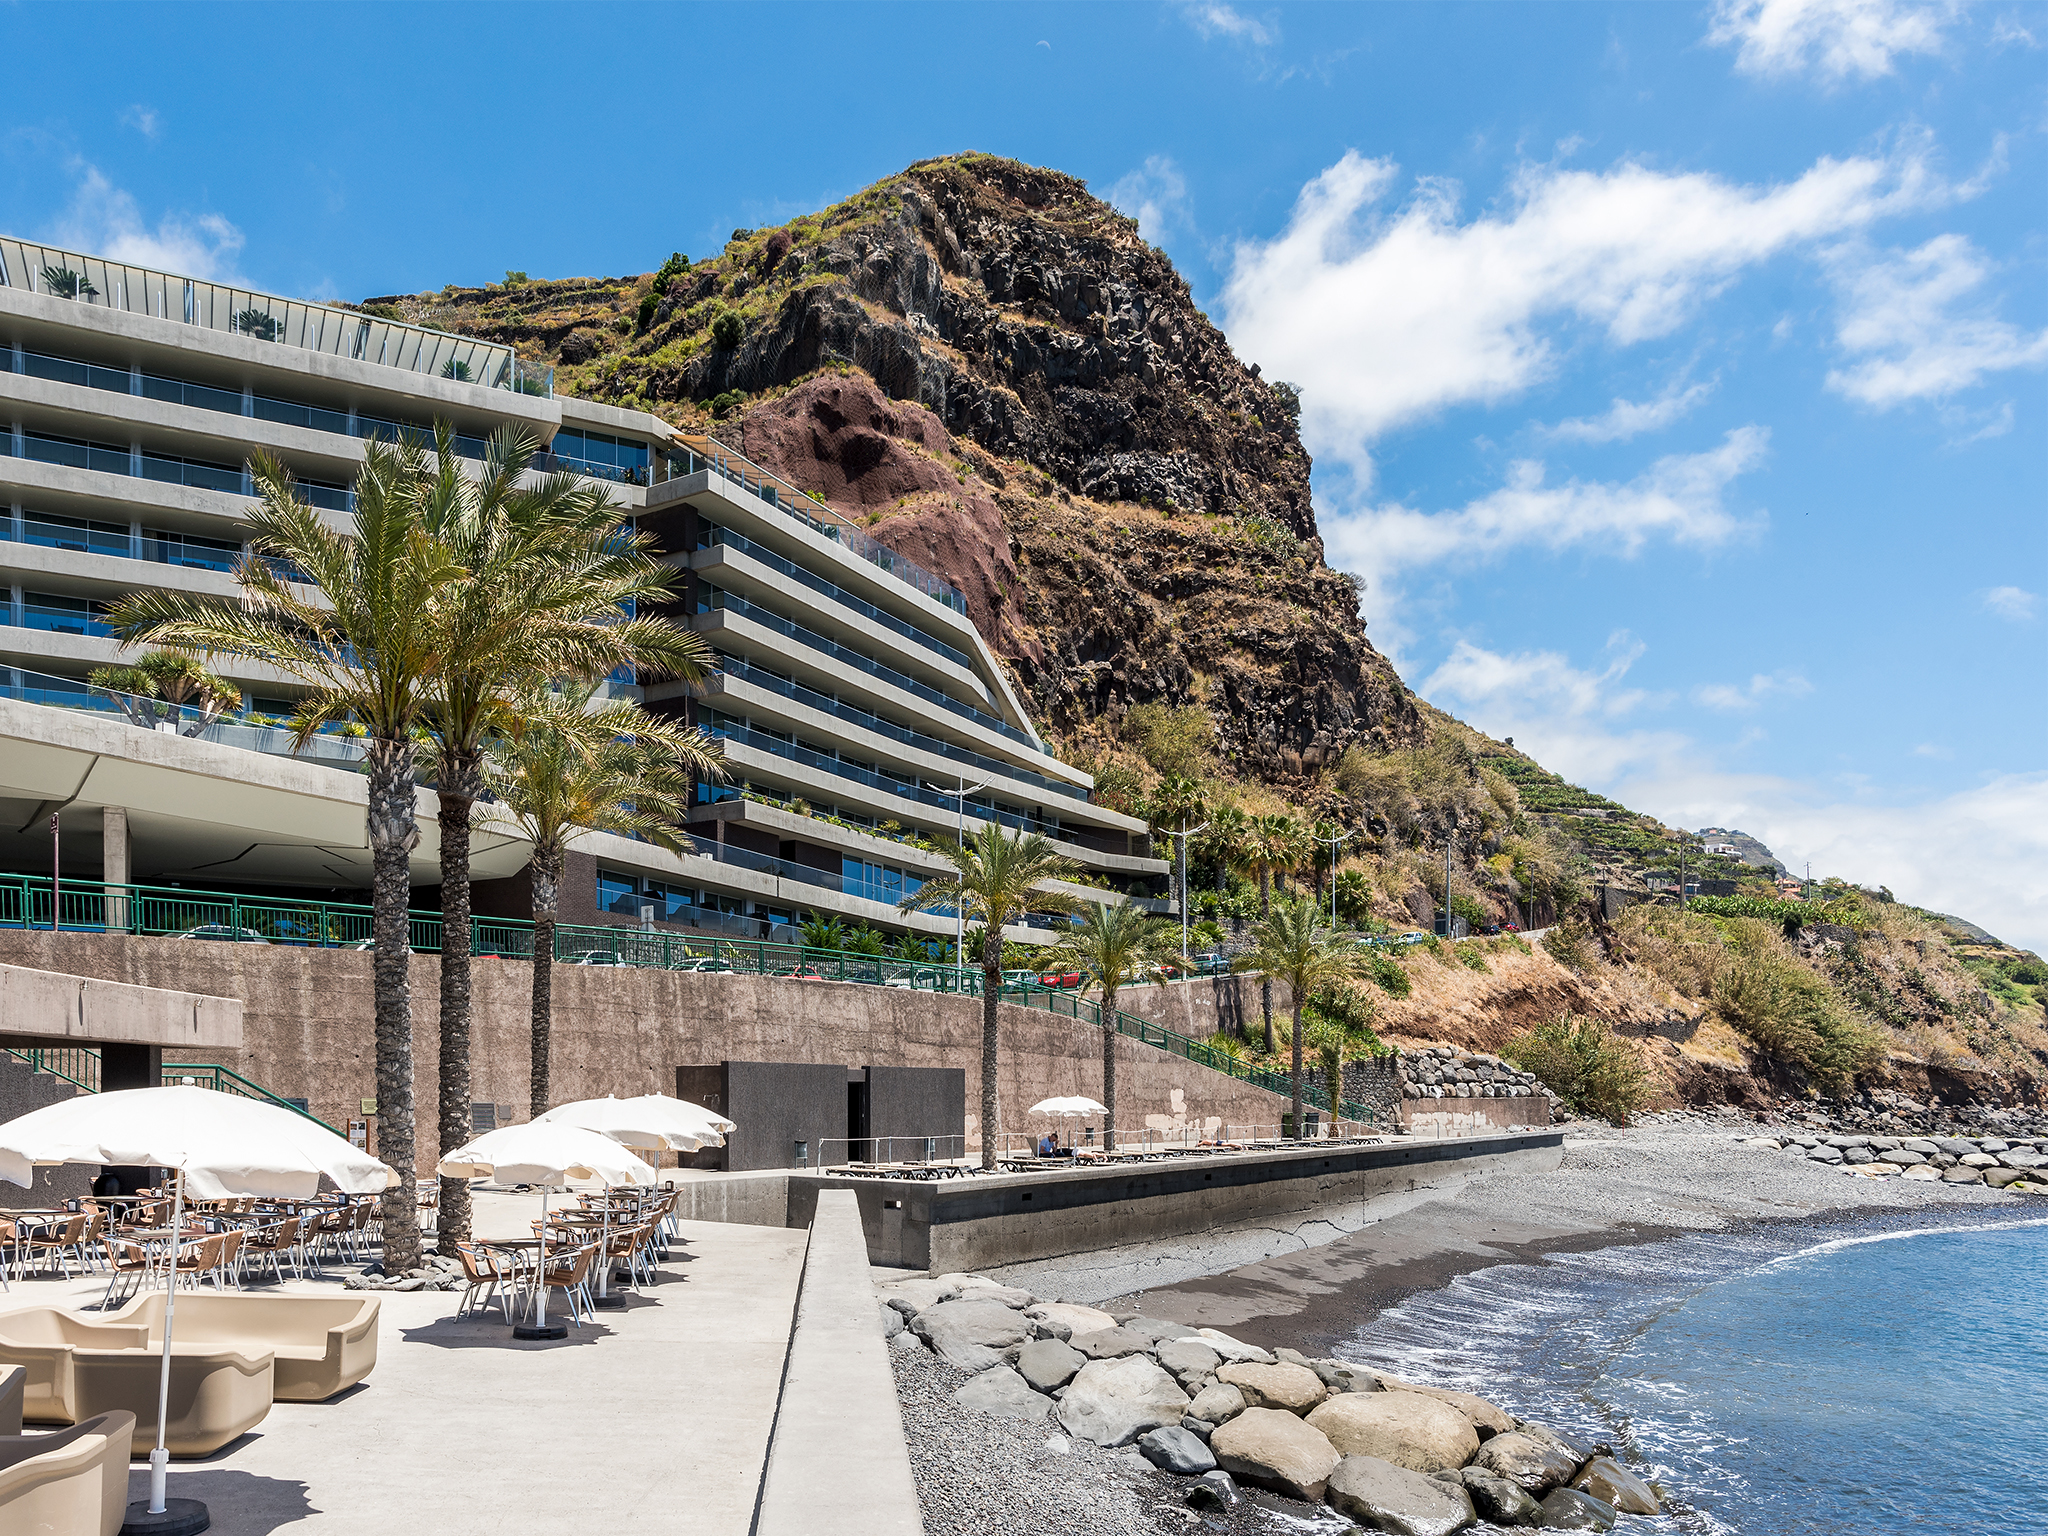 Hotel, Saccharum Hotel, Porto Santo, Madeira